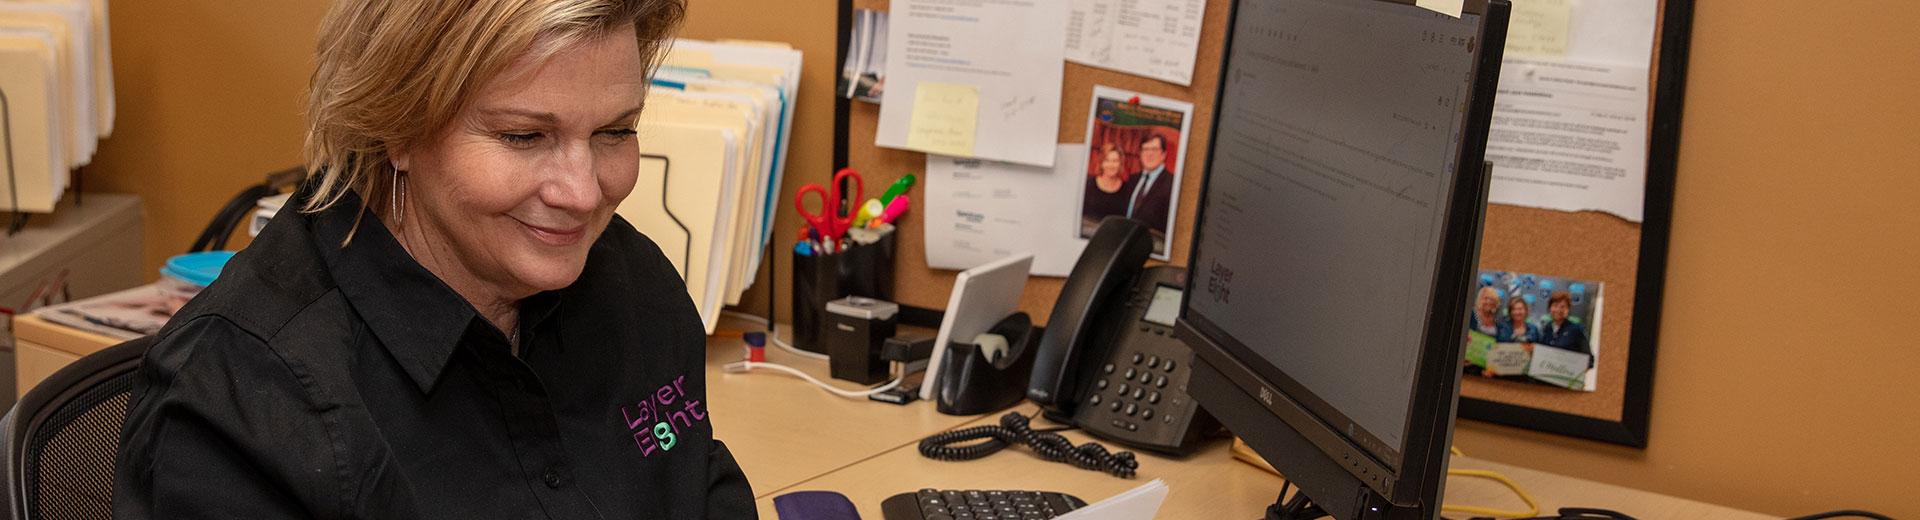 Champlain Technology worker at her desk